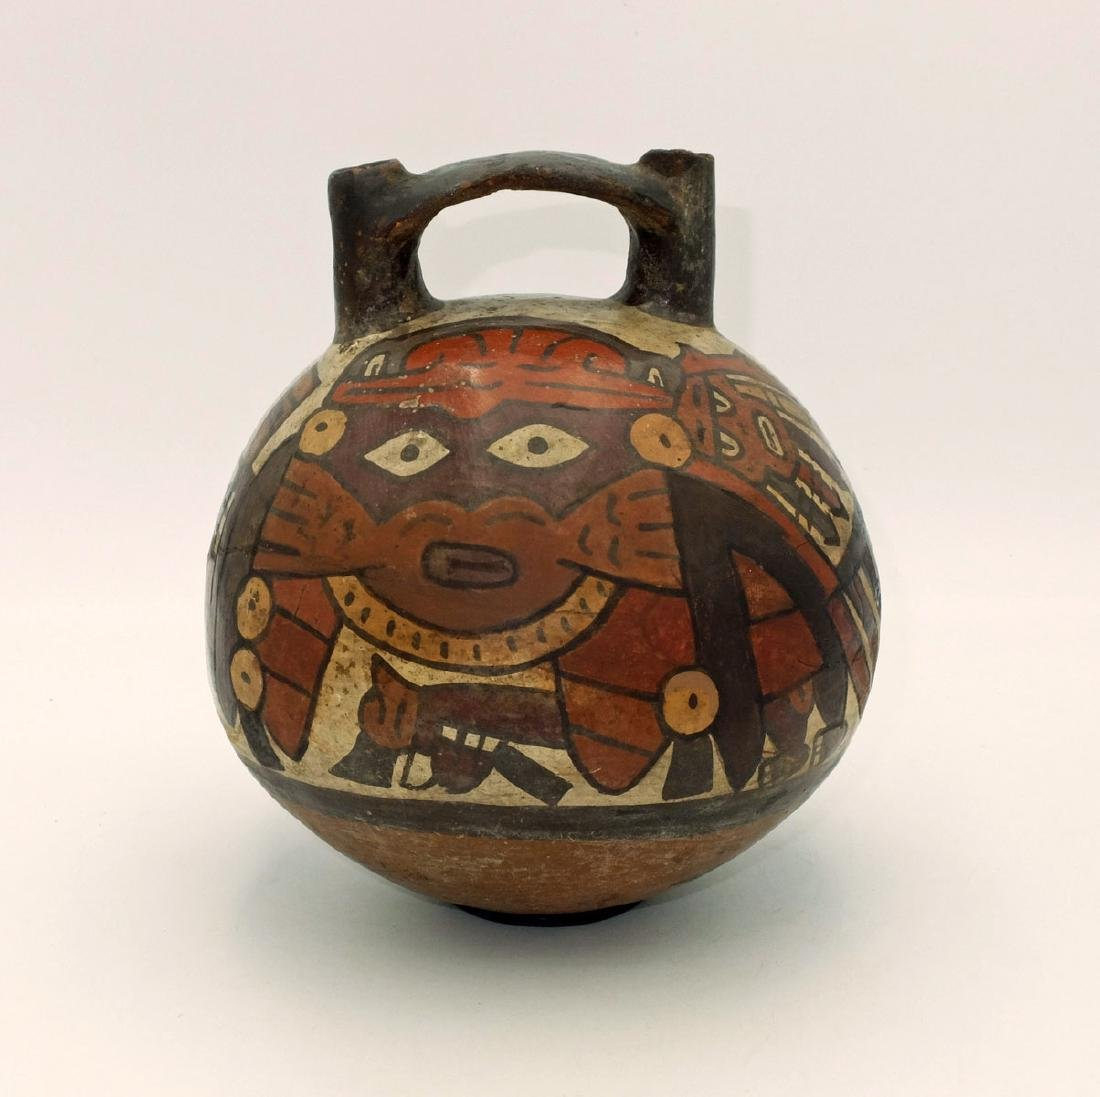 A fine Nazca polychrome vessel w/ the Spotted Cat